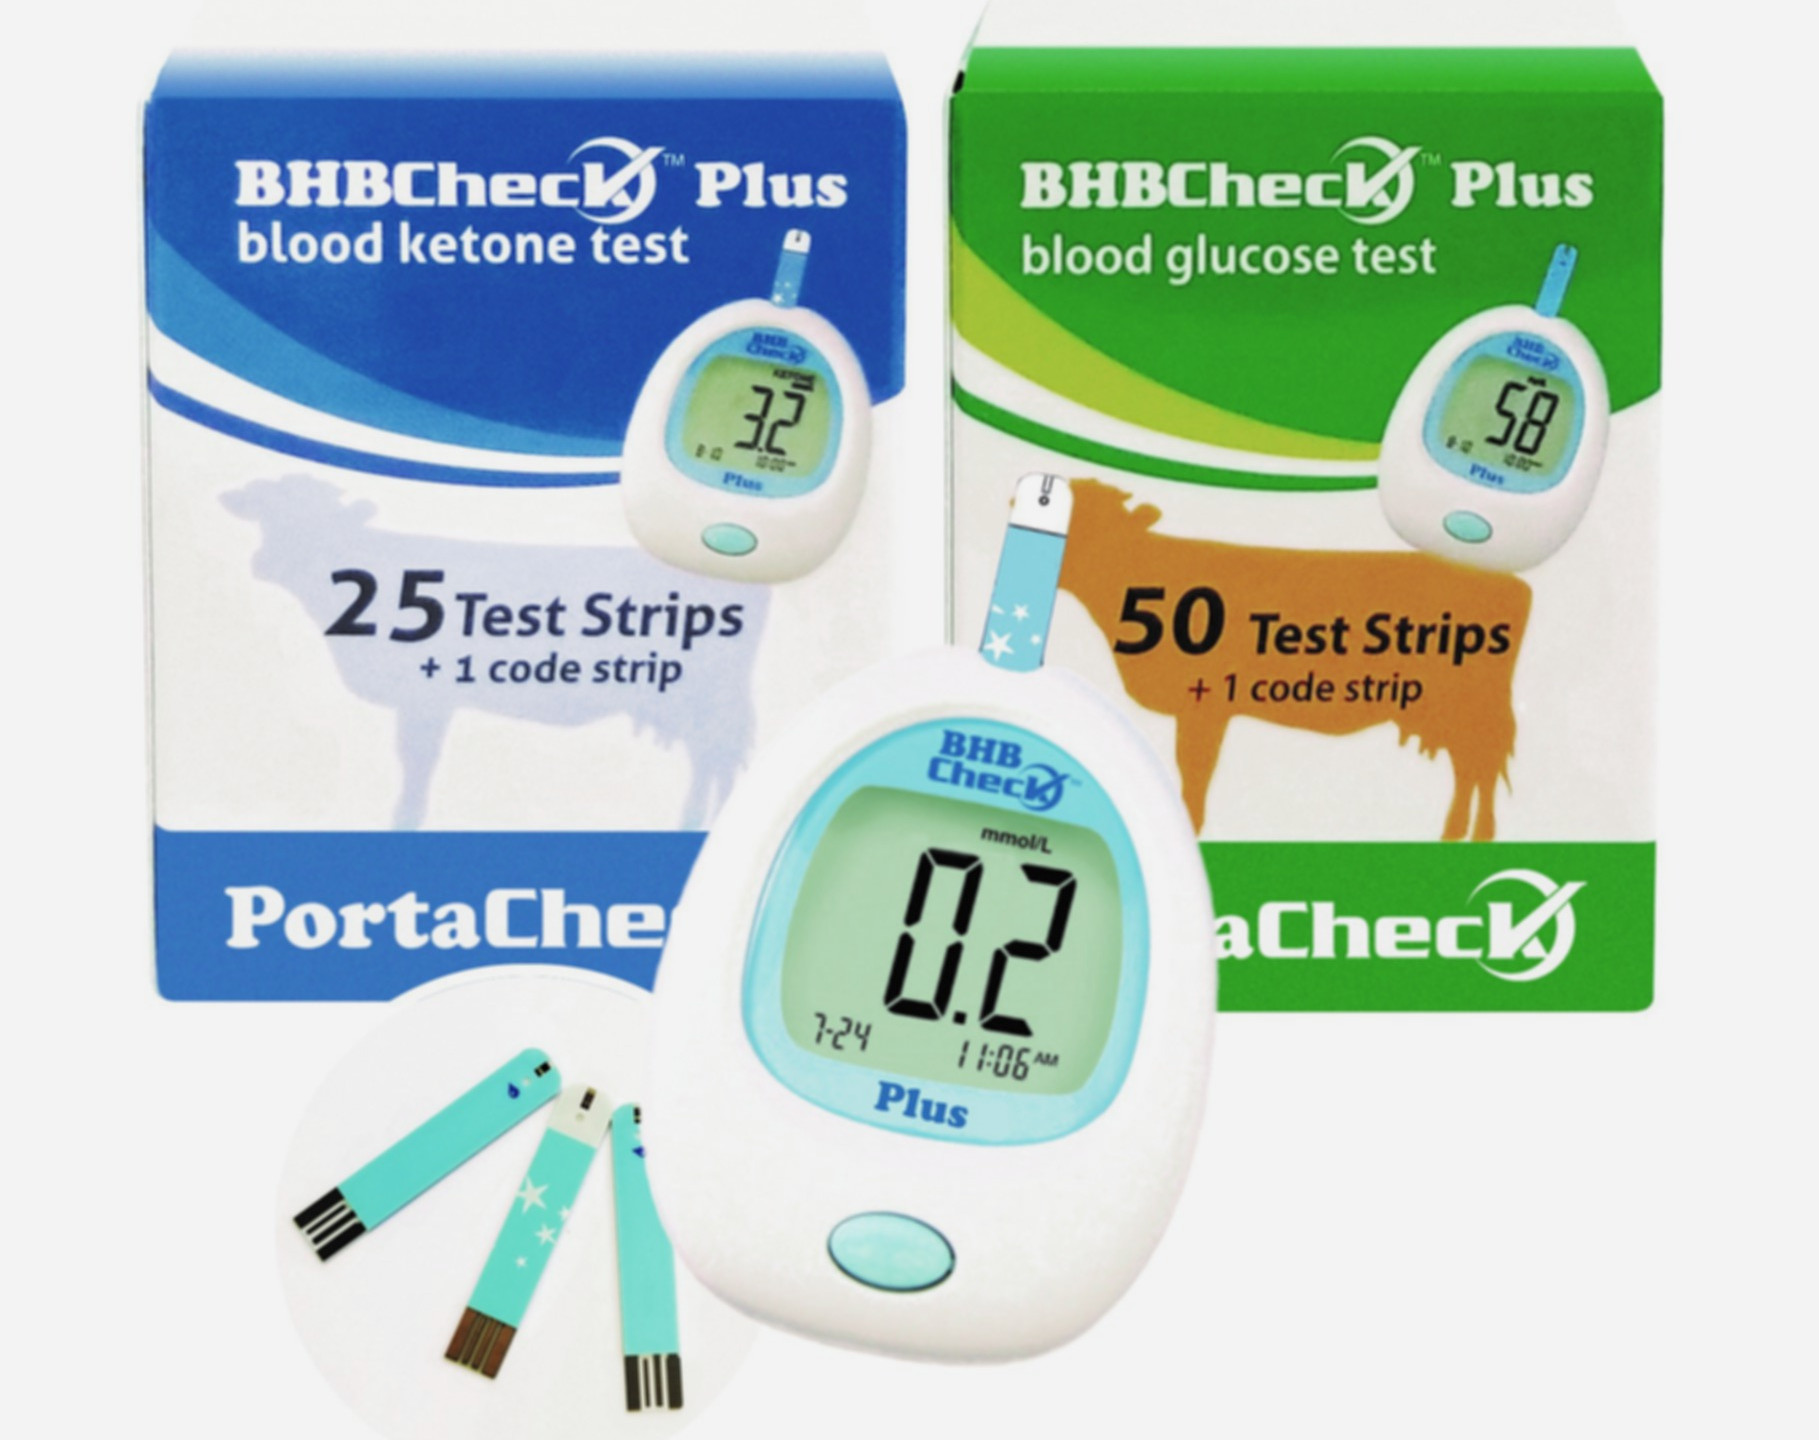 PortaCheck, Portatest, Porta Check, BHB, ketosis, on-farm tests, BHBCheck, BHBCHeck Plus, blood ketone meter, glucose, bovine blood, whole blood, 5 second test, screening, mmol/L